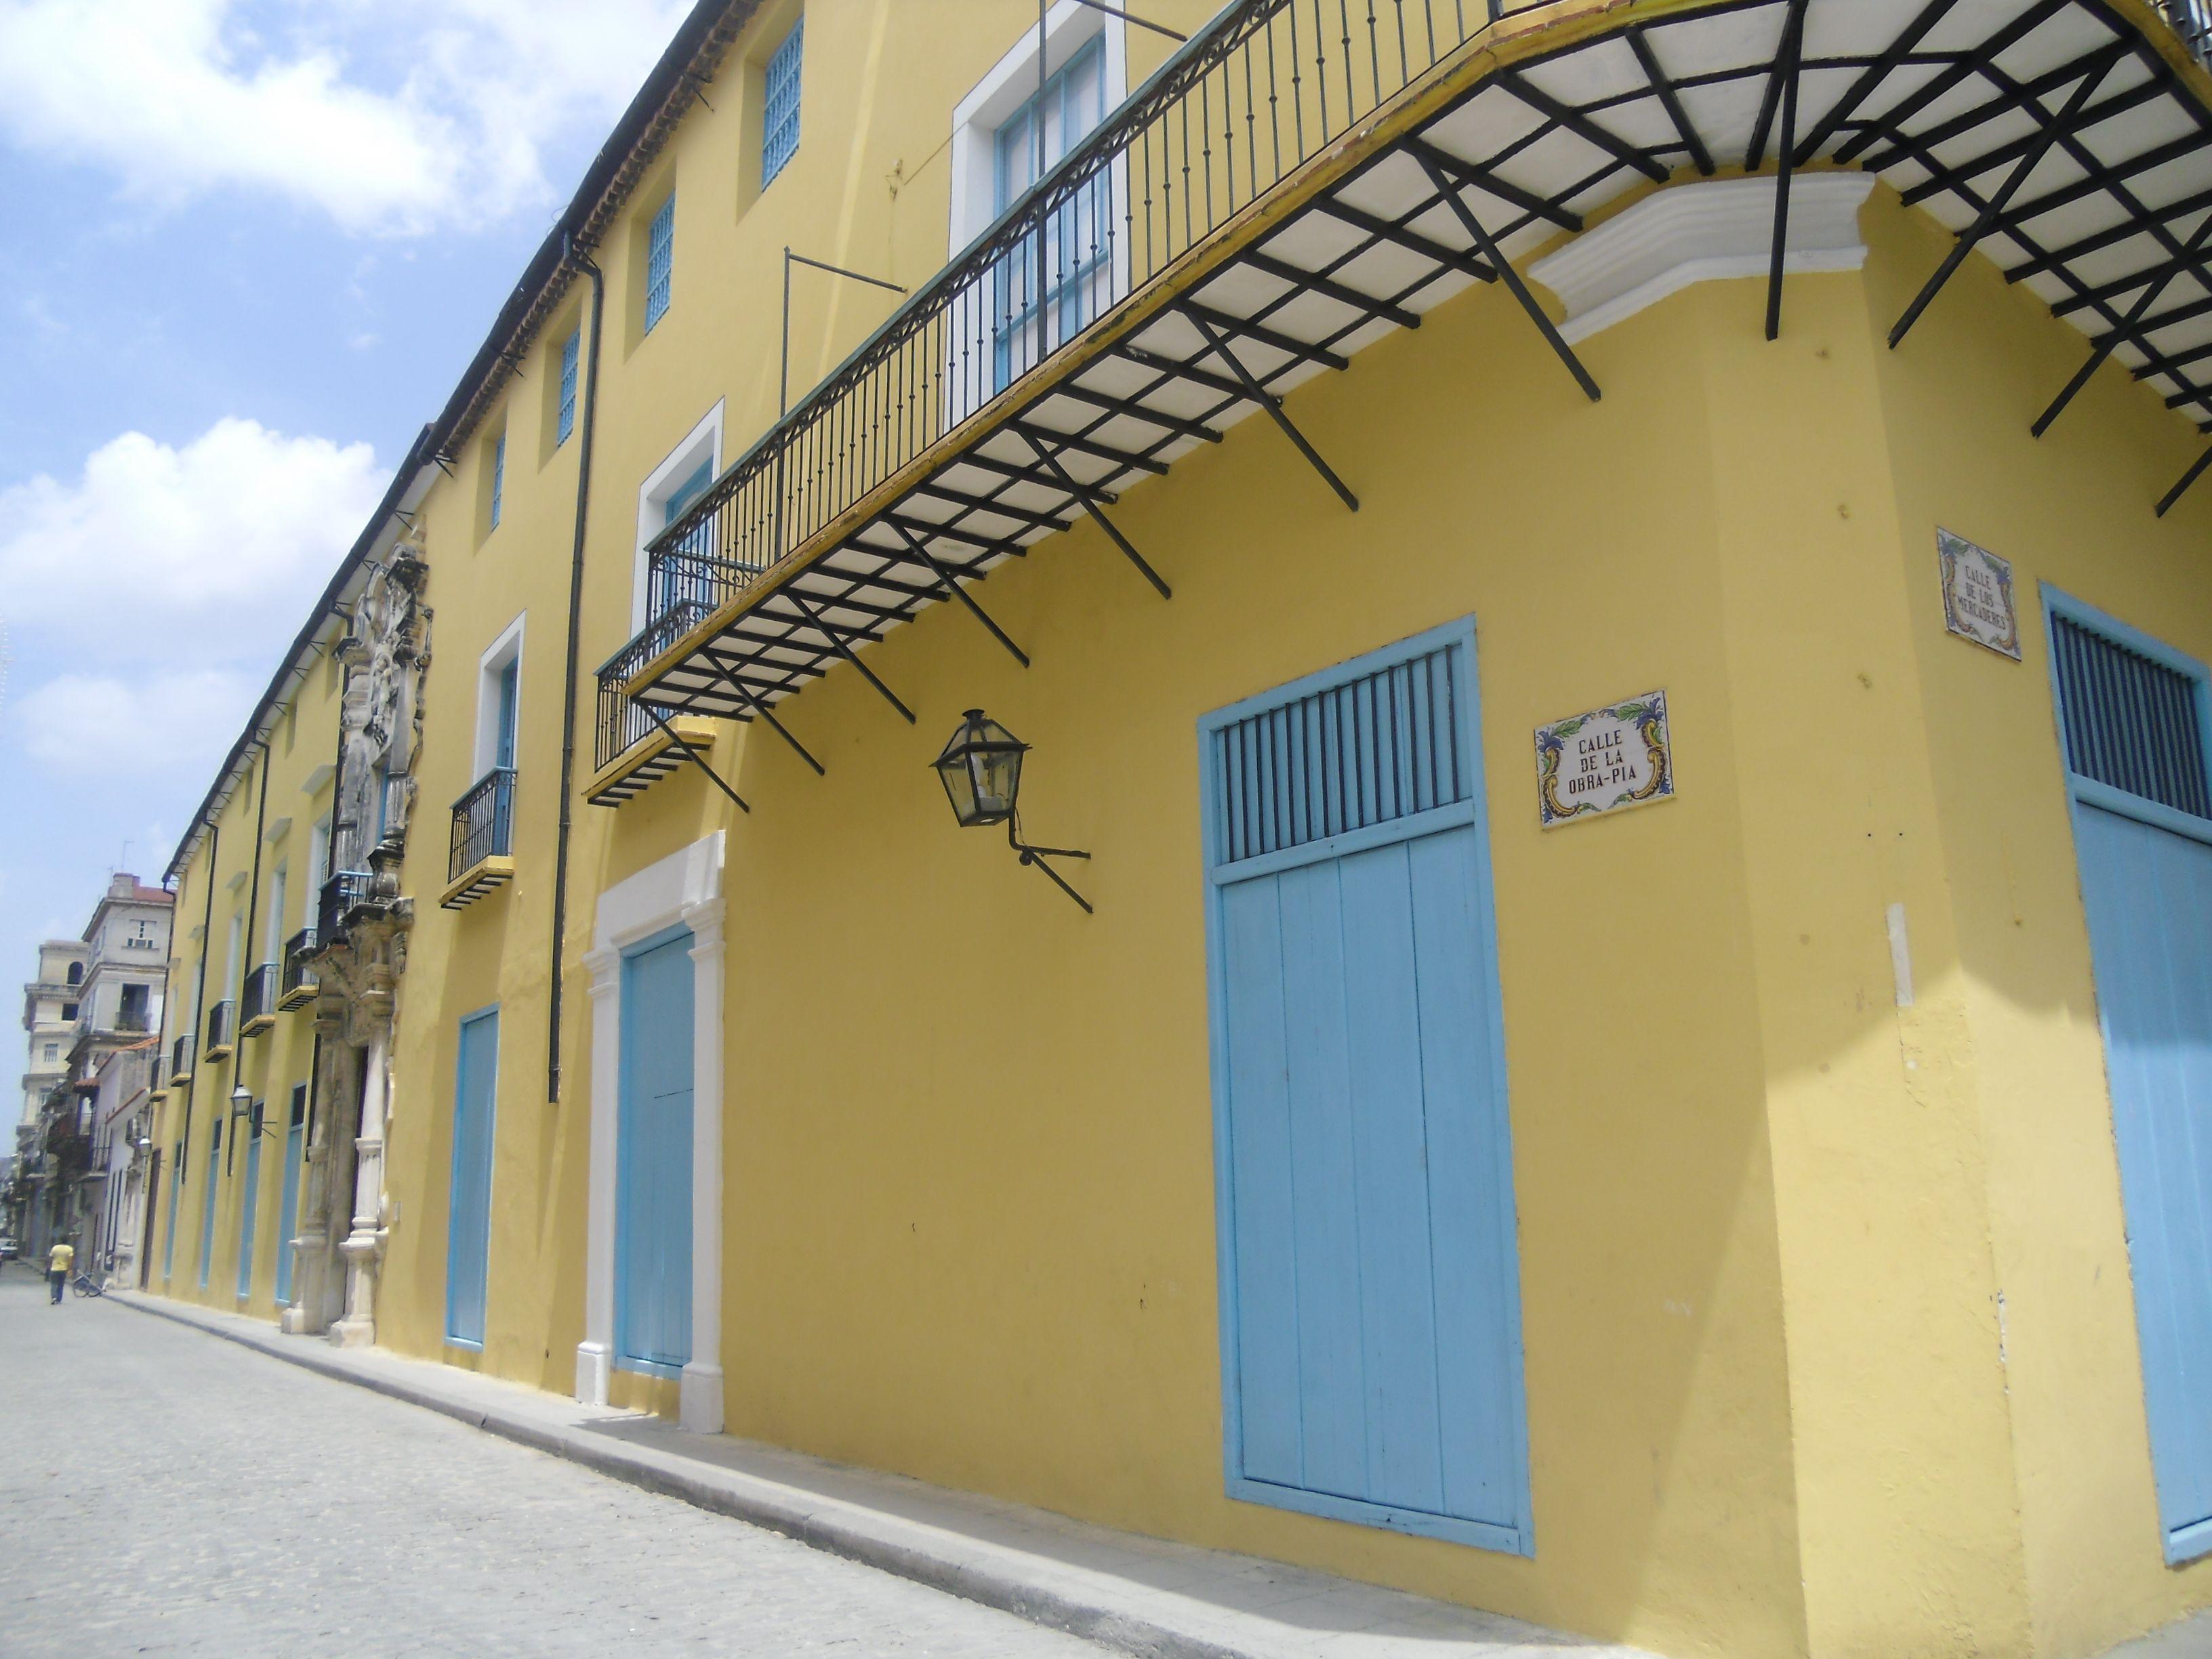 Calle en la Vieja Havana - CUBA